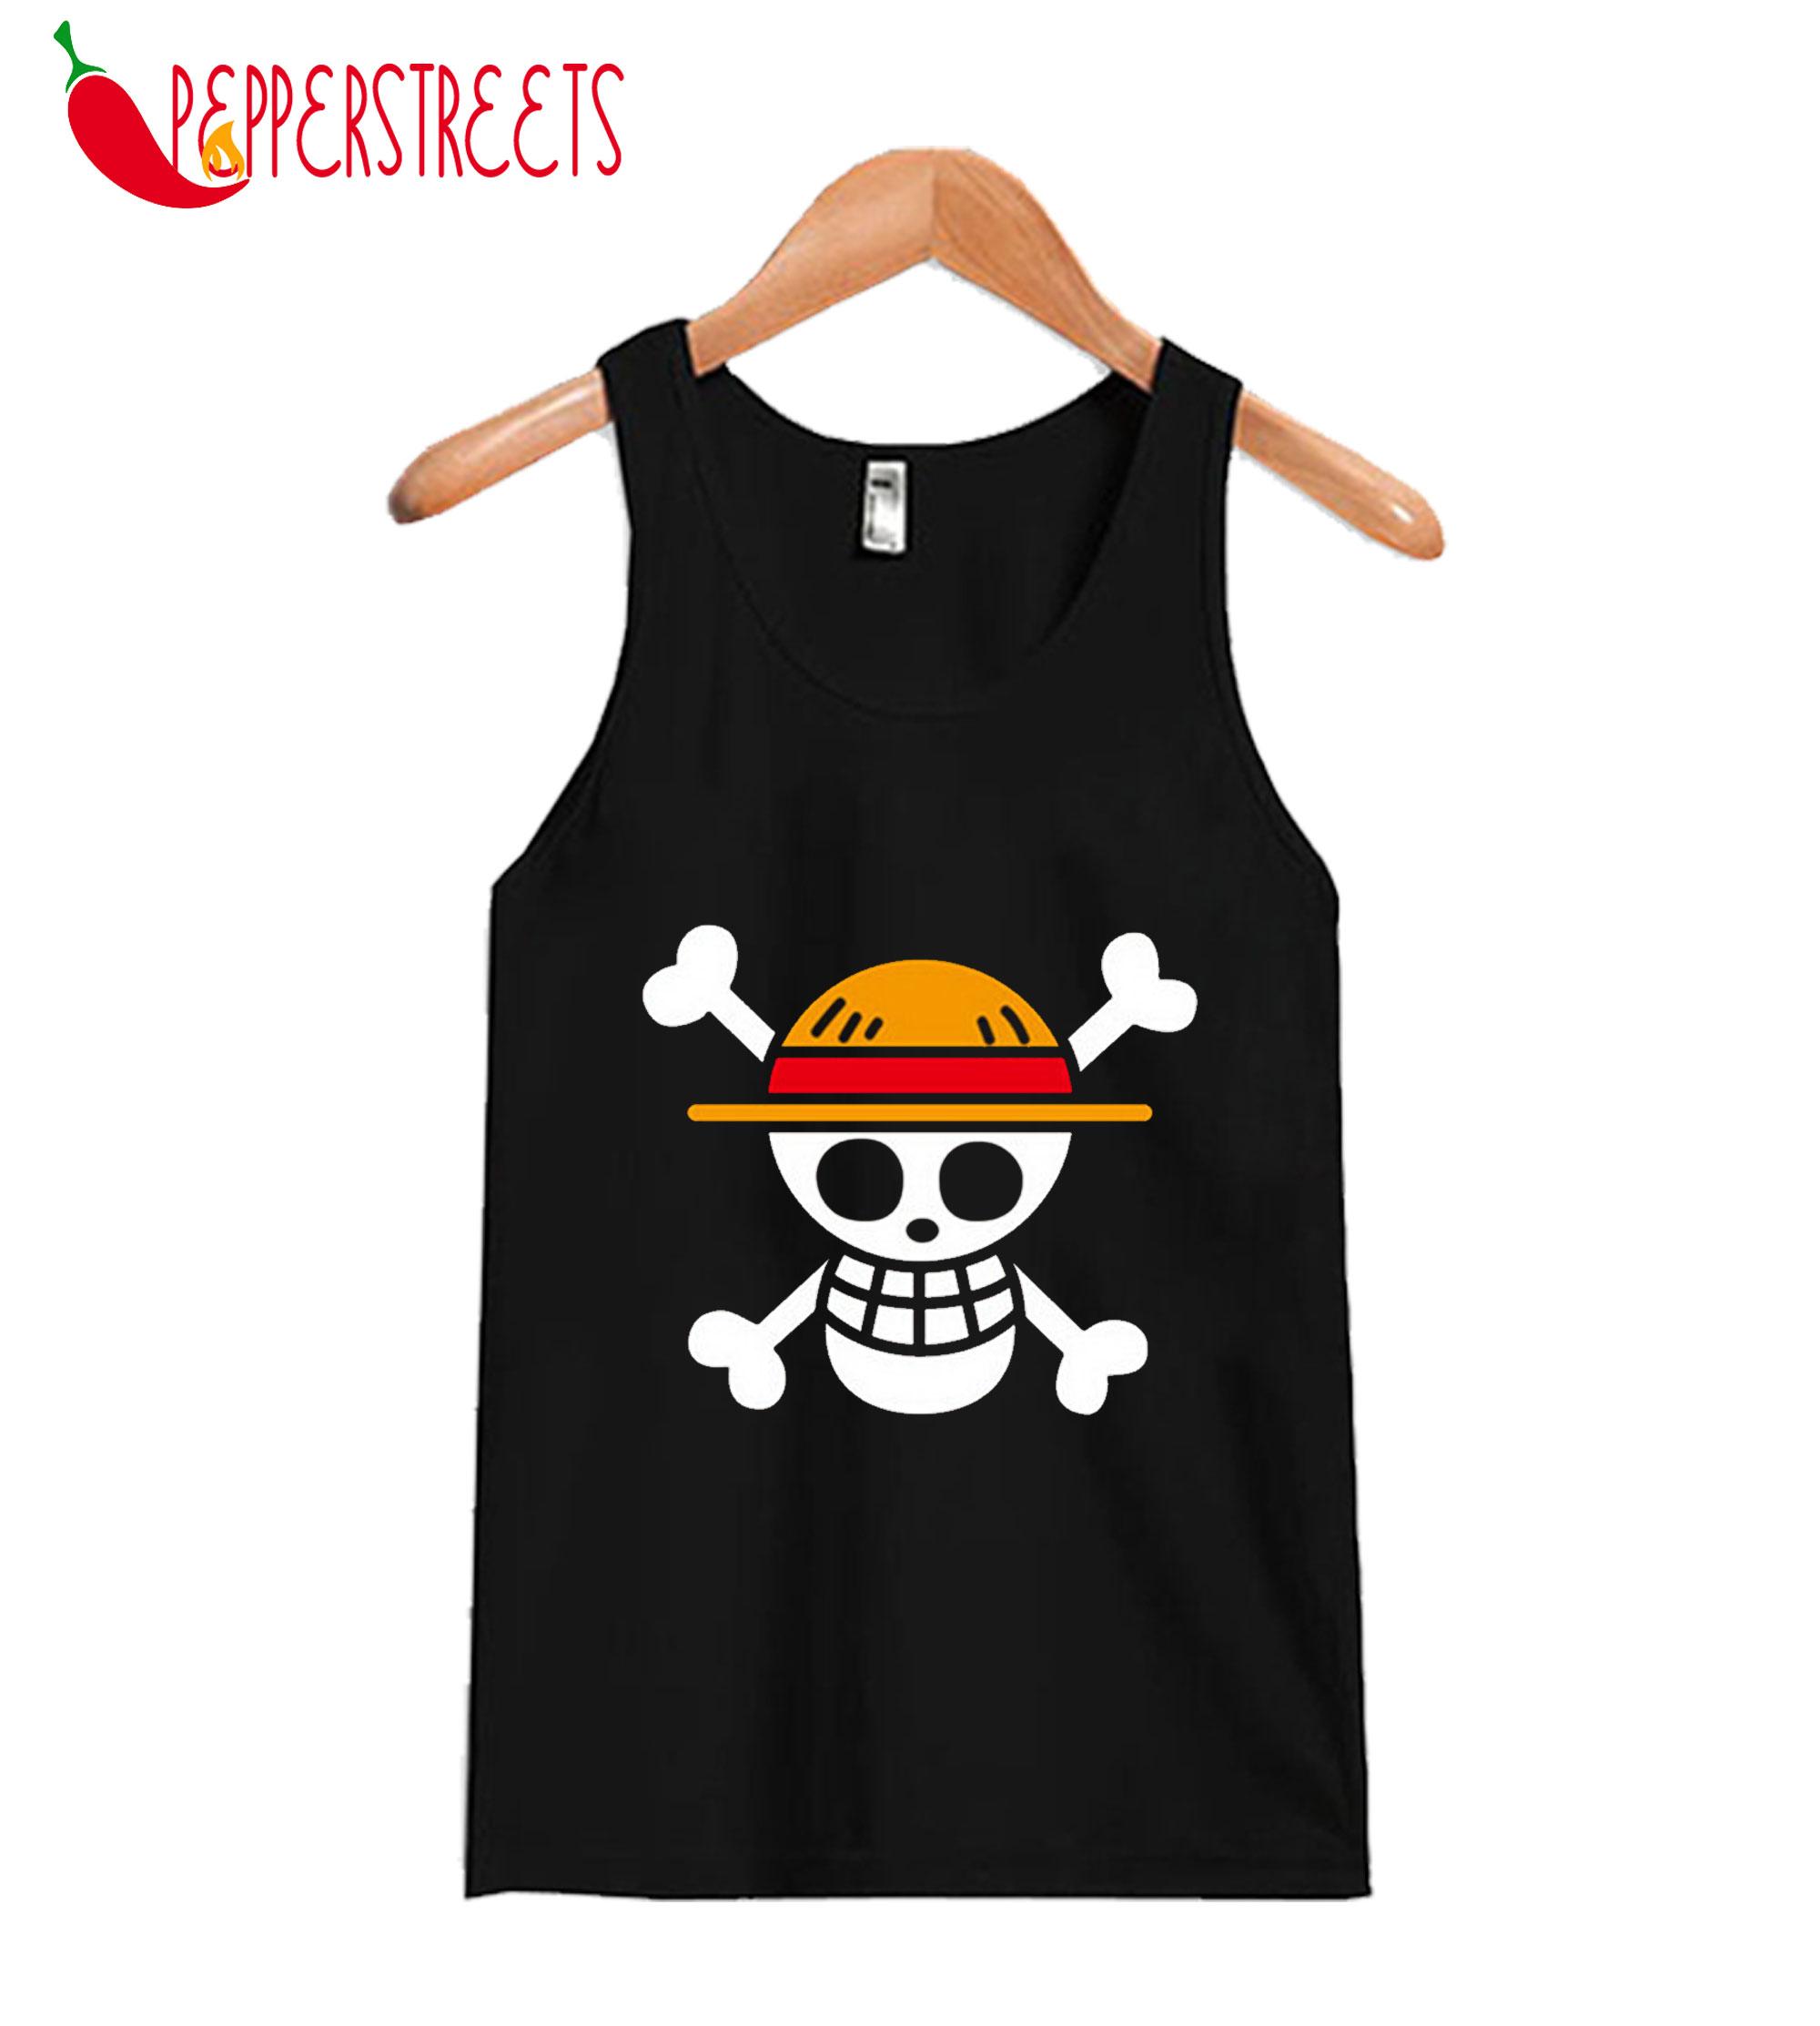 Compre One Piece Camisetas Designer Anime Tank Top